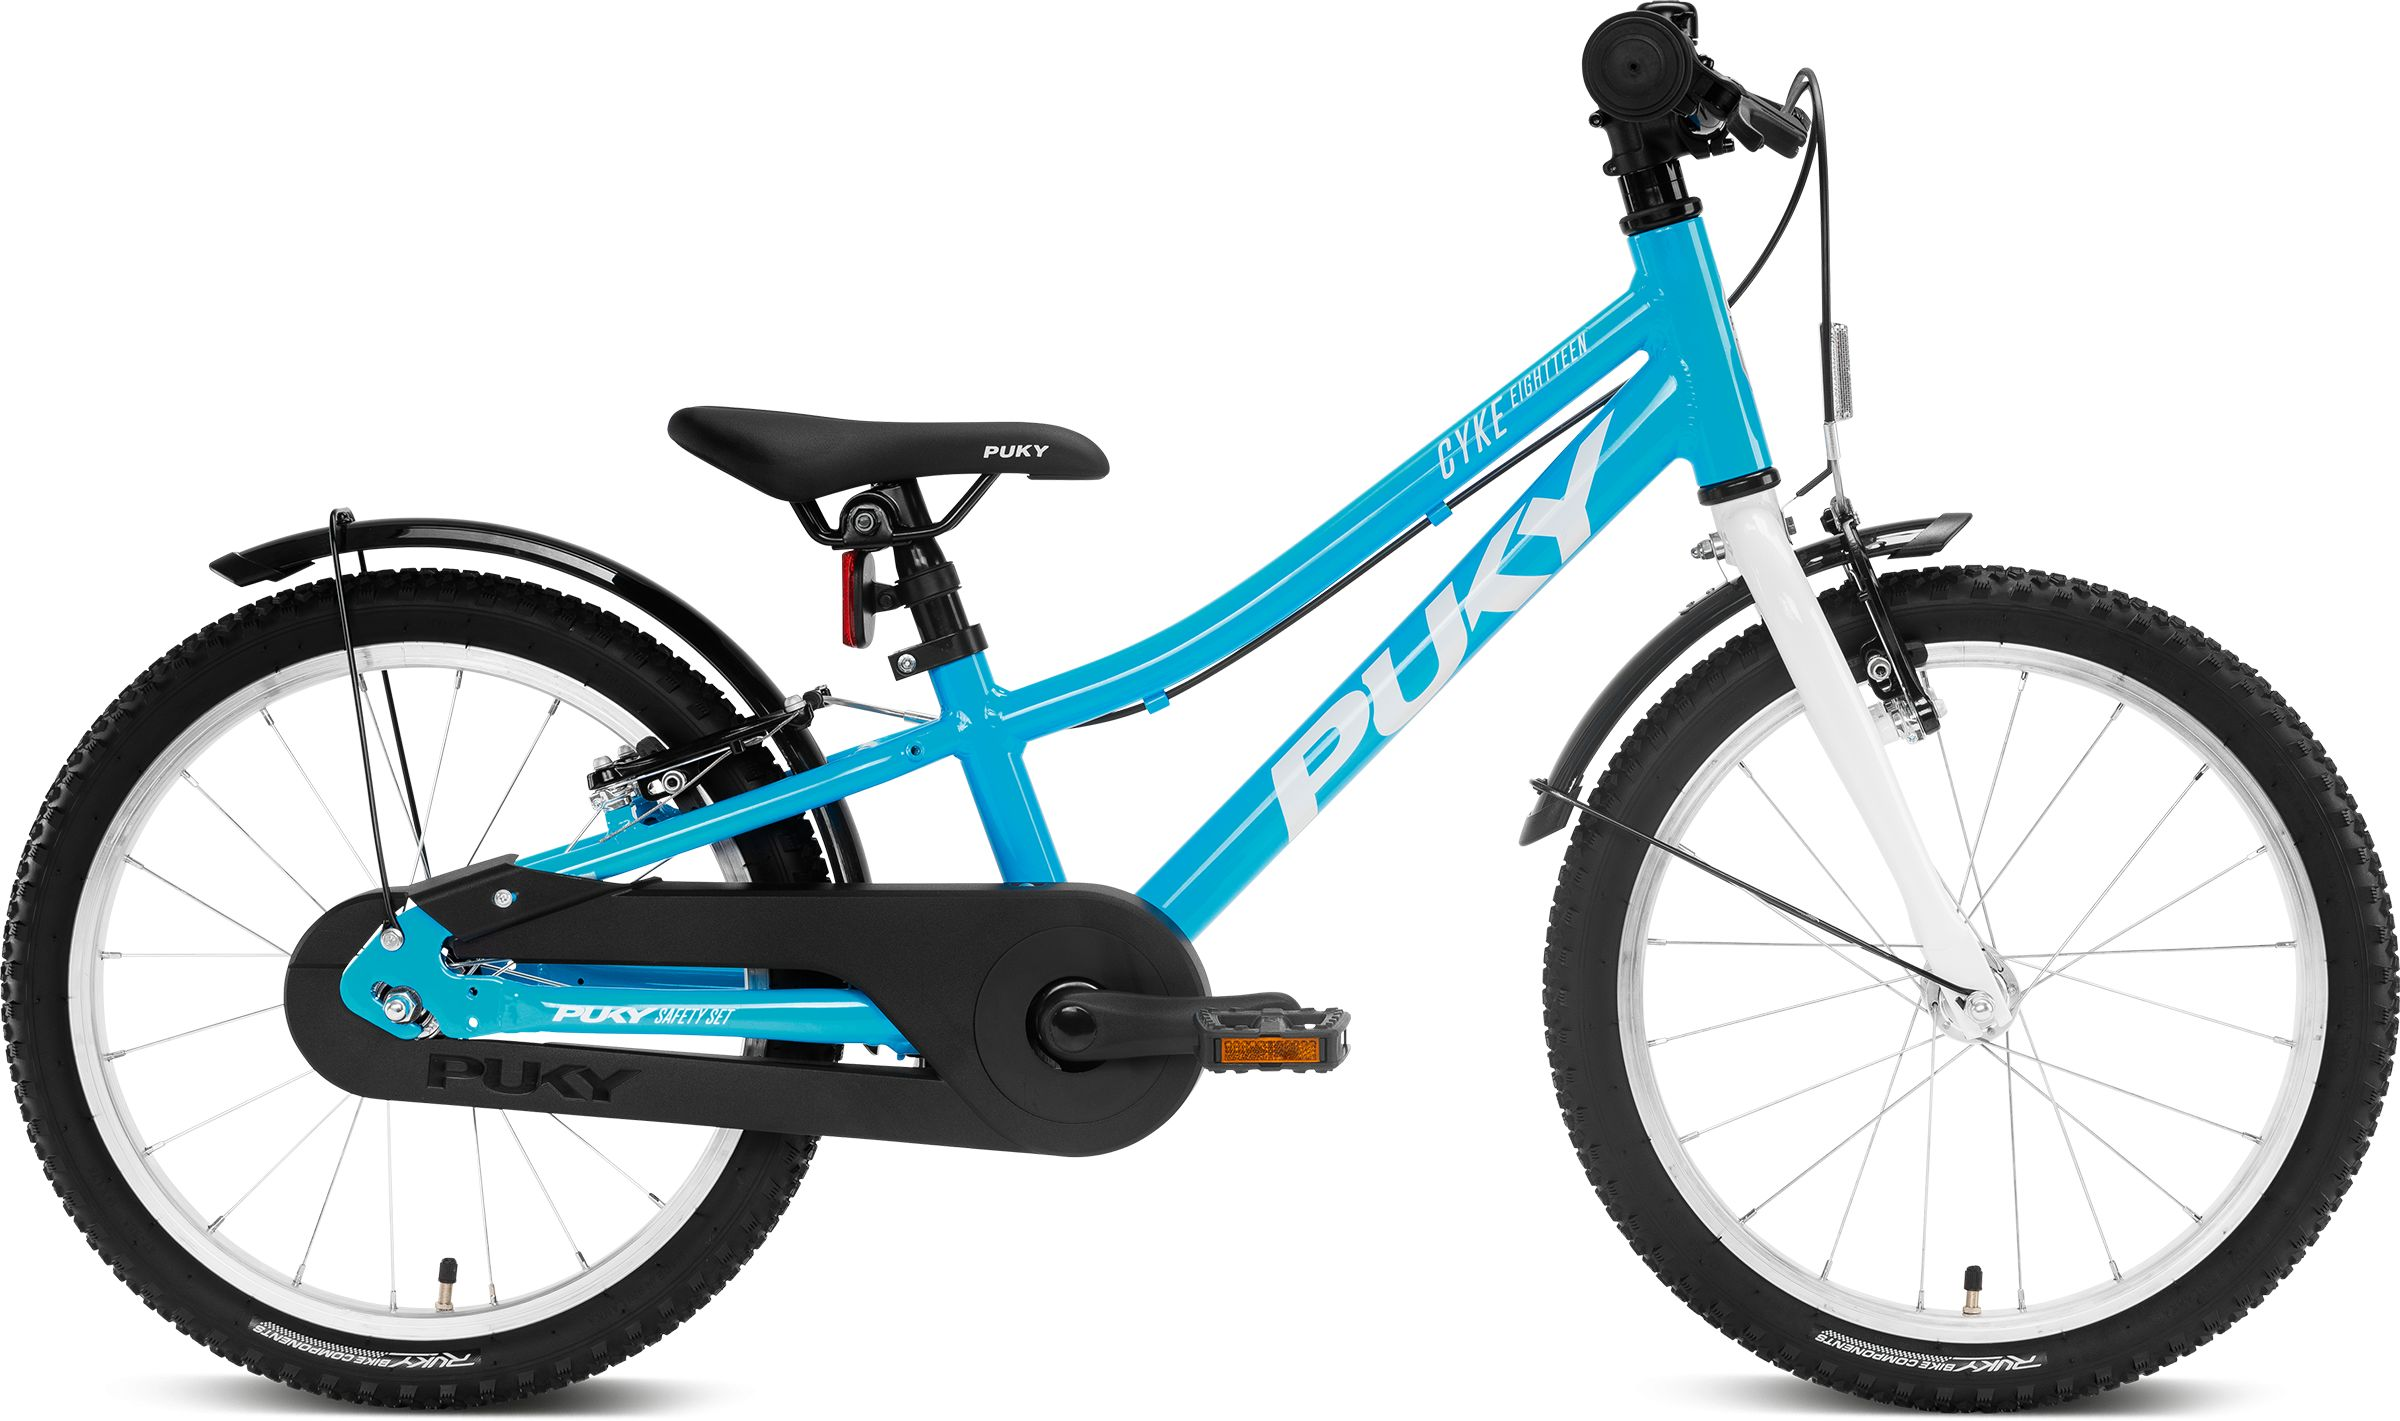 Rower Puky Cyke 18-1F Blue 4419 wolnobieg